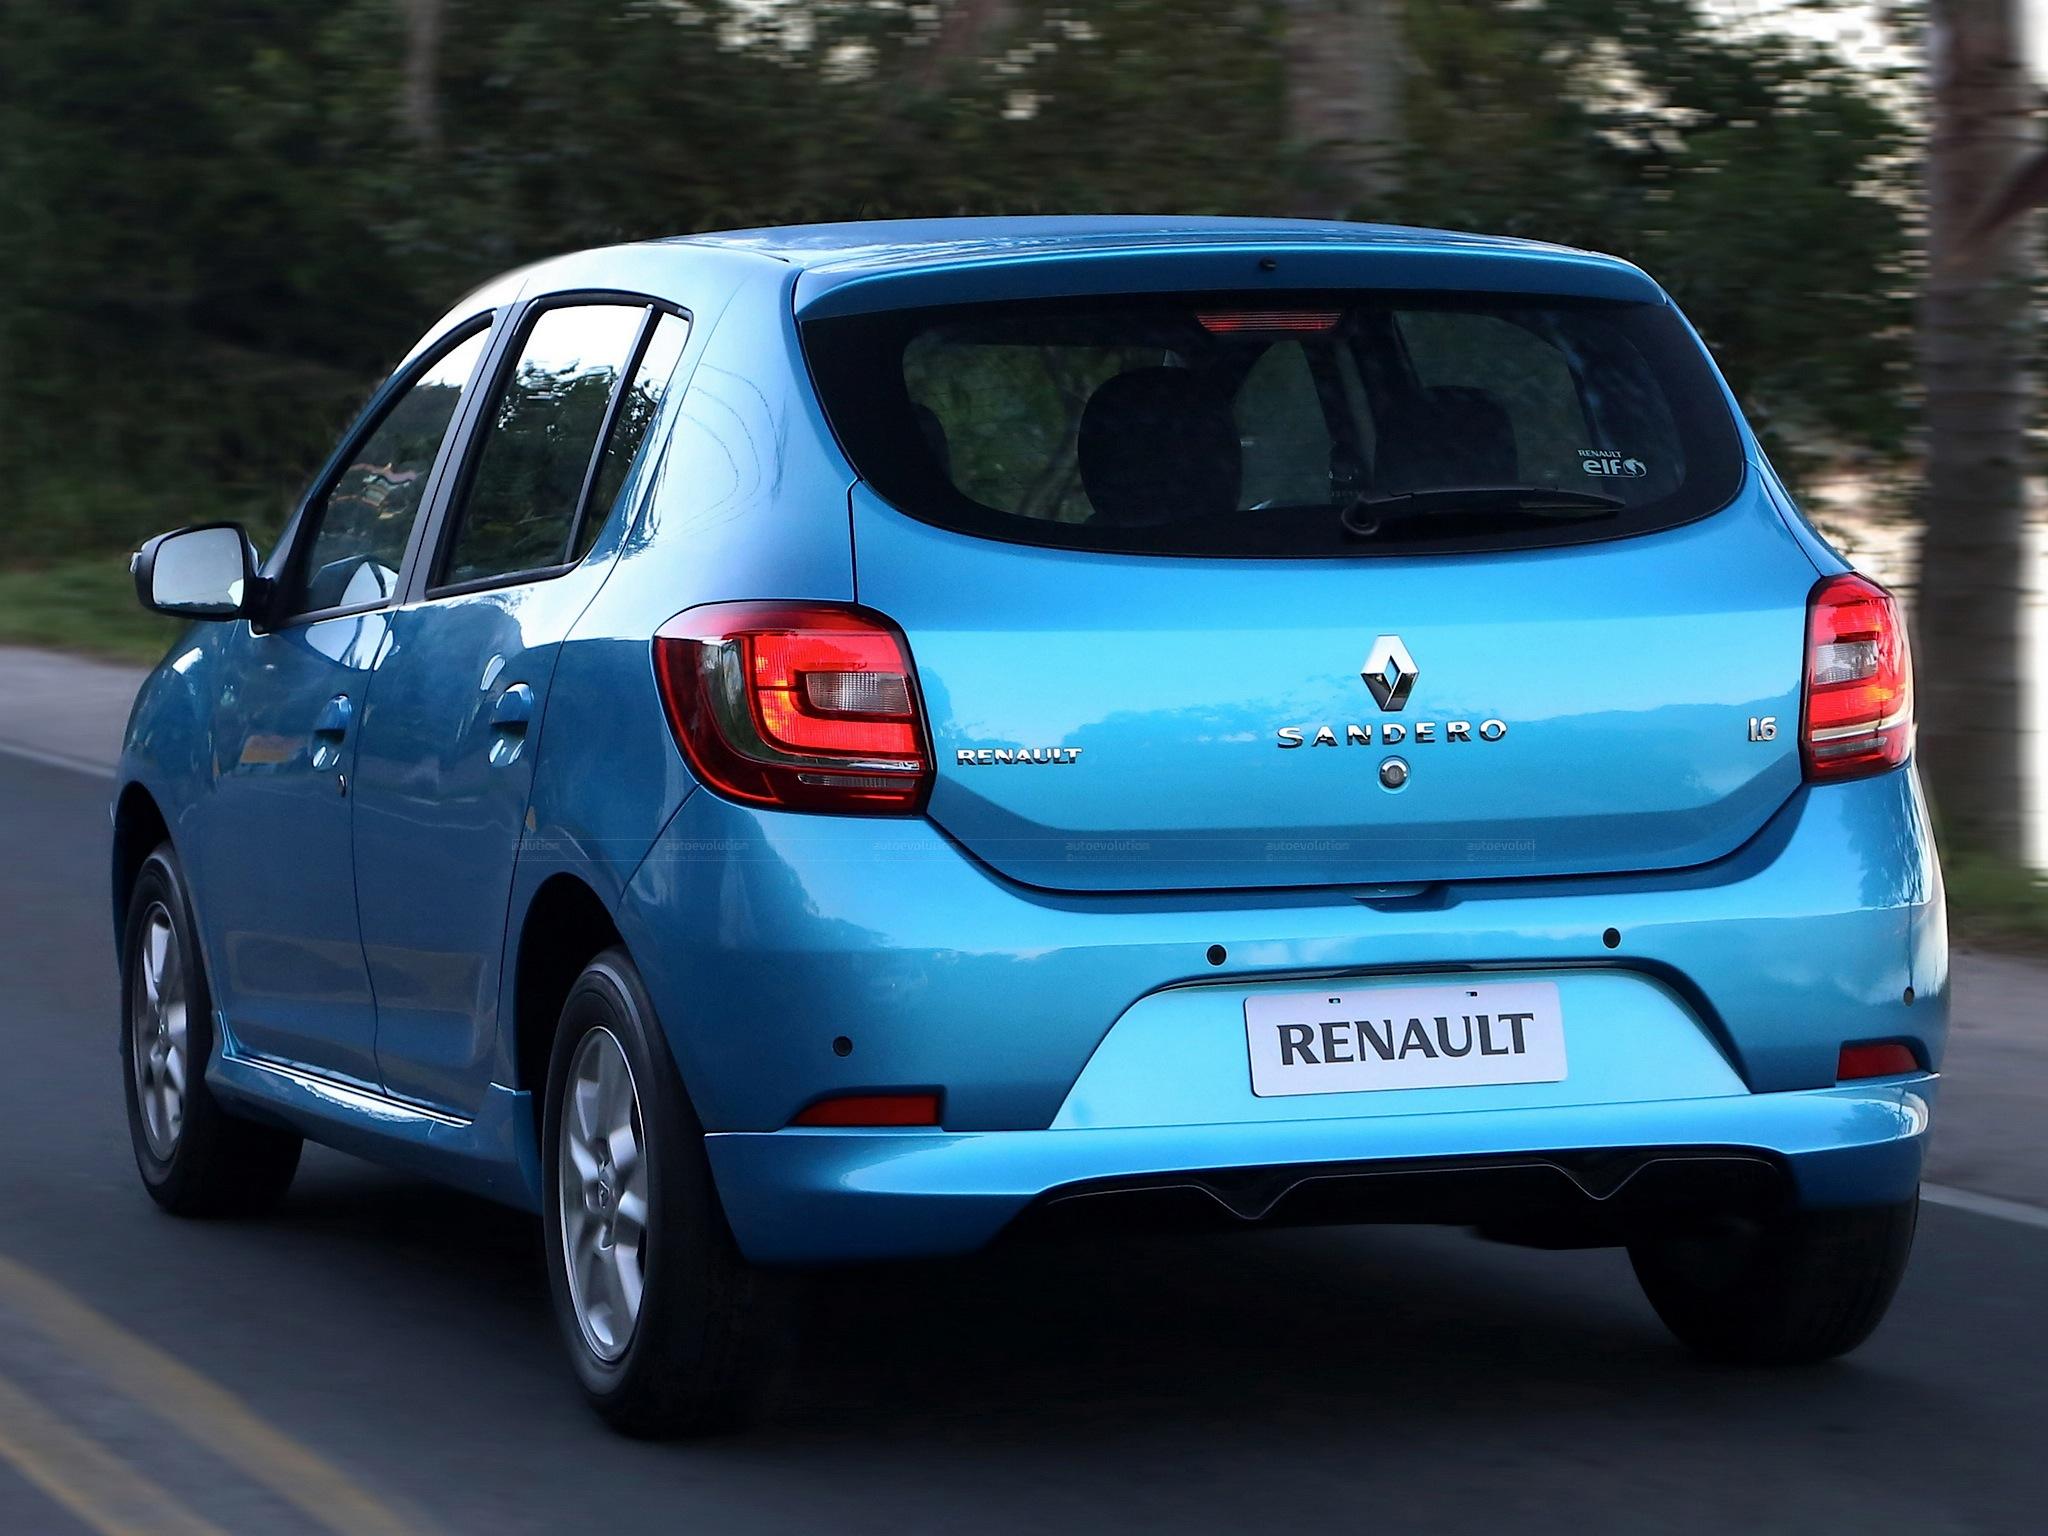 Alfa img - Showing > Renault Sandero Dynamique 2014